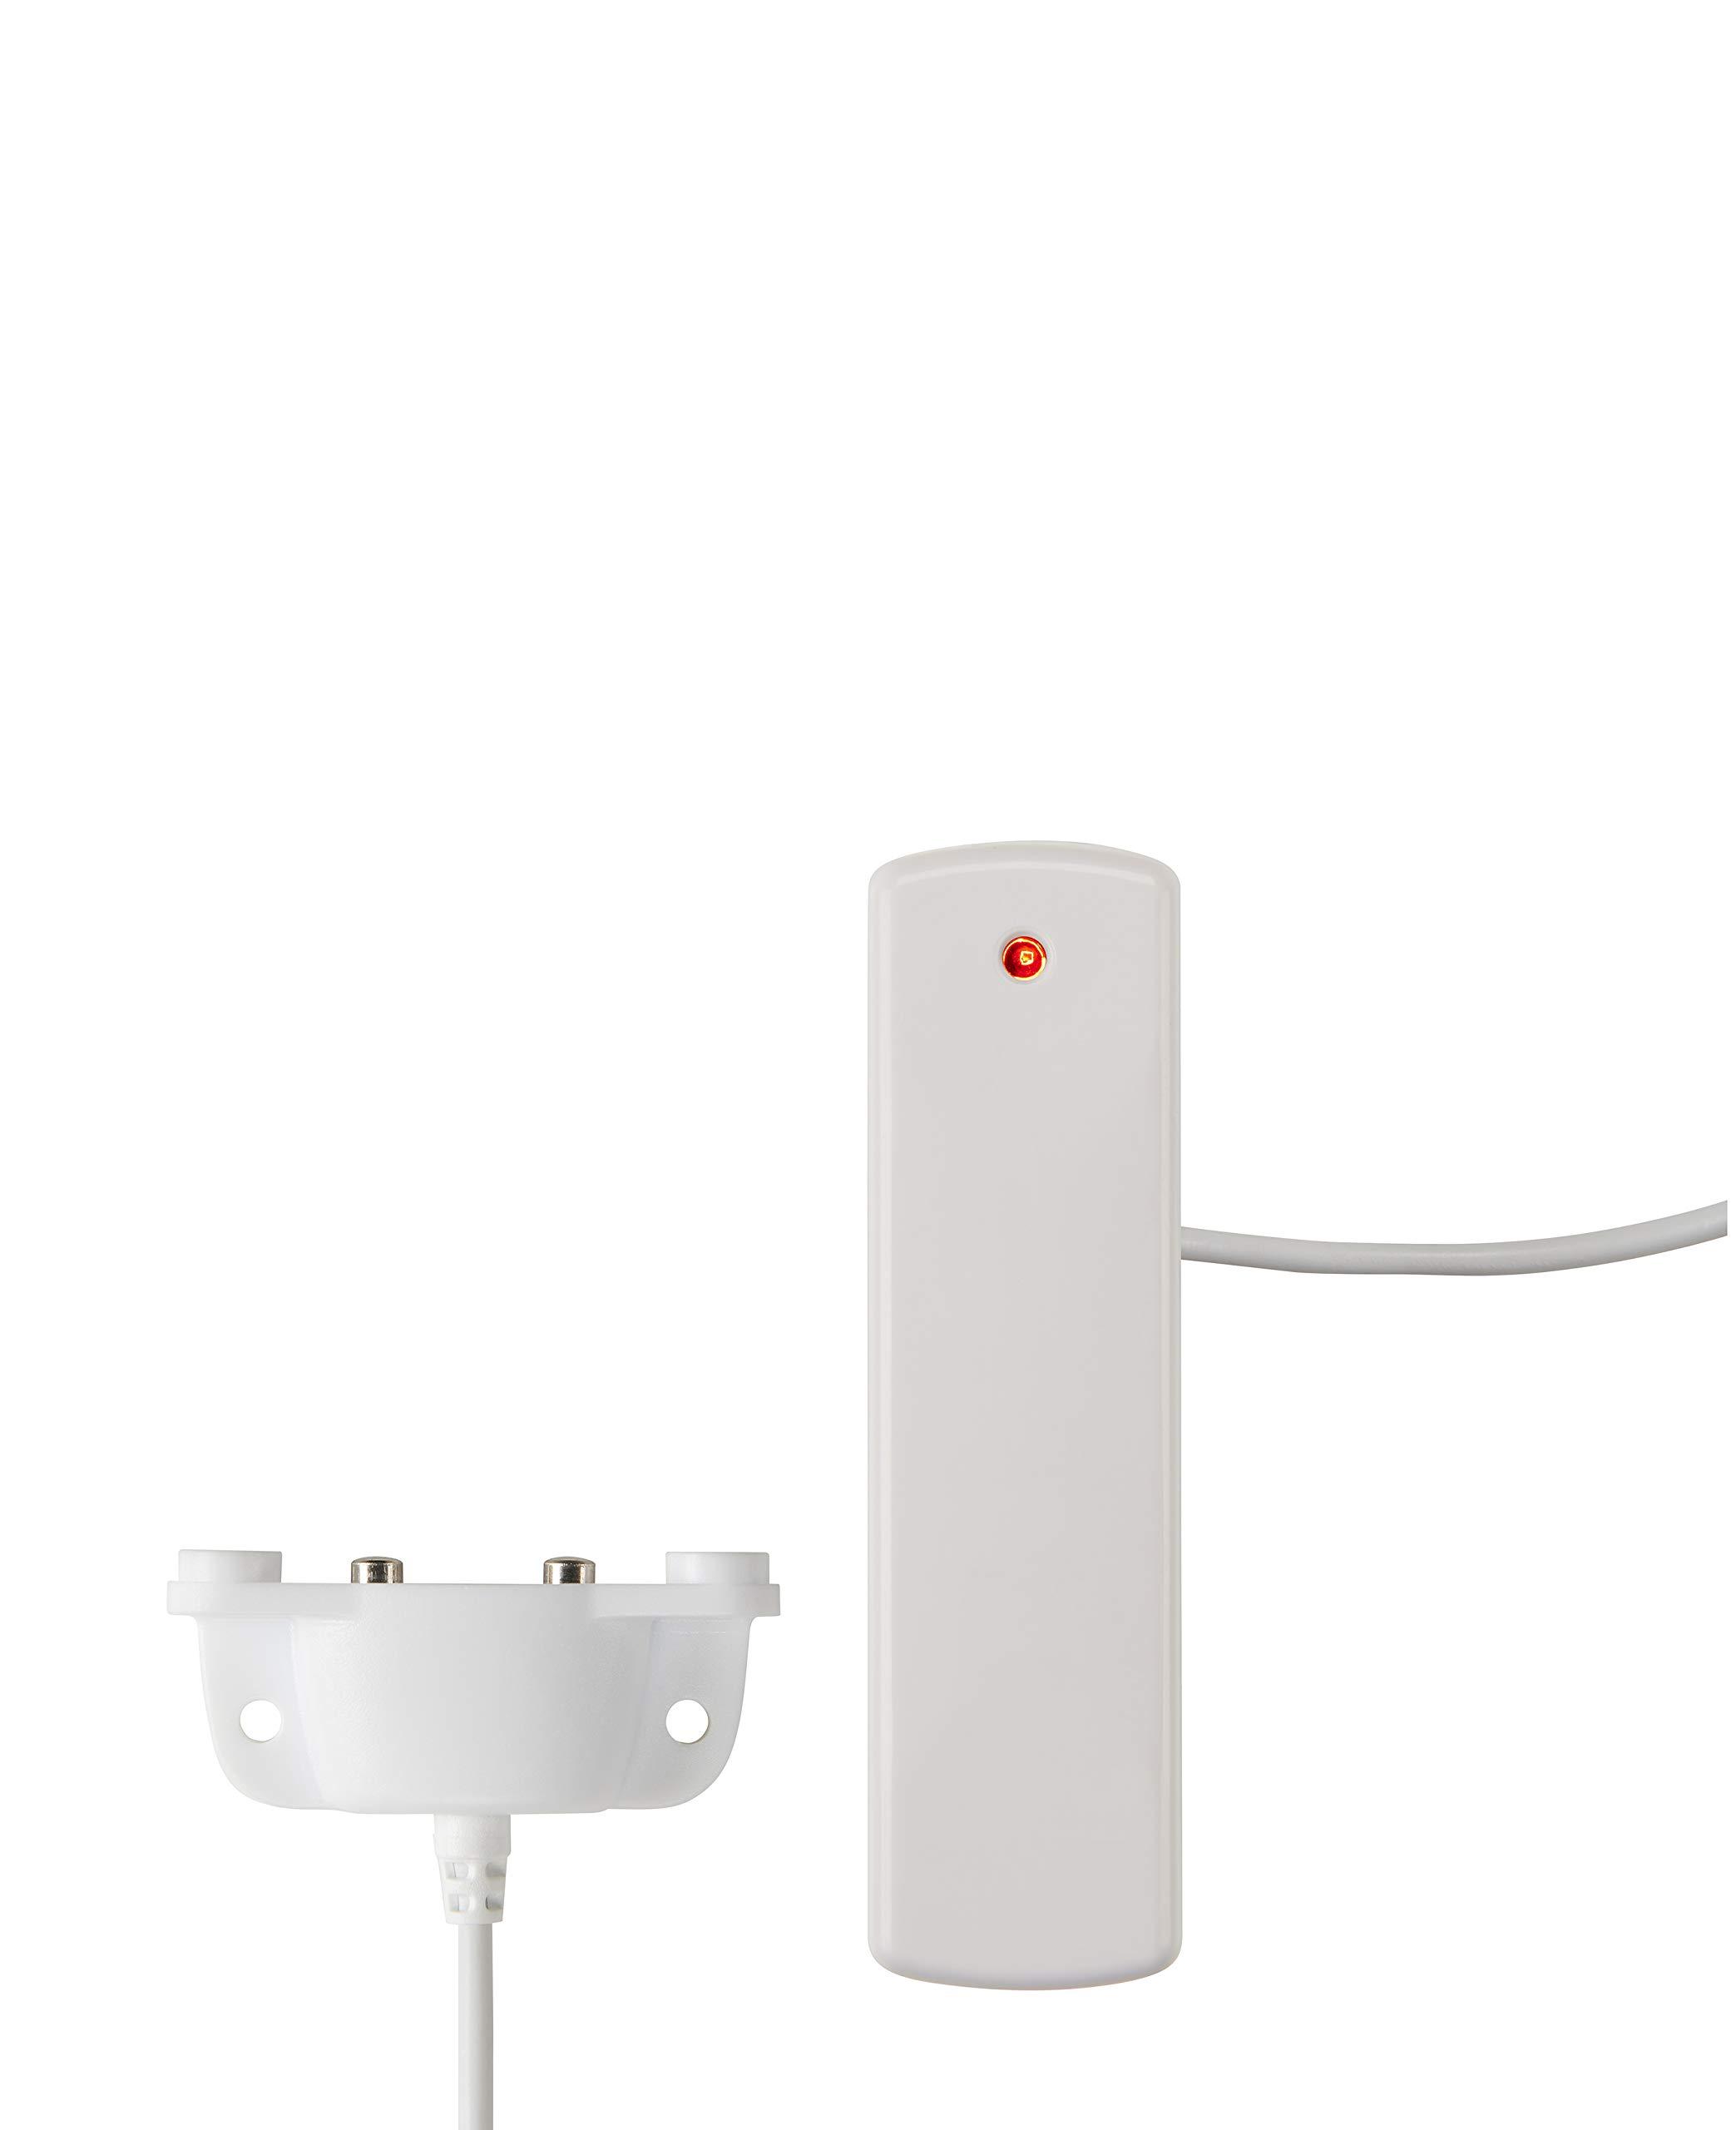 Ecolink Zwave Plus Flood Amp Freeze Sensor Simply Smart 123